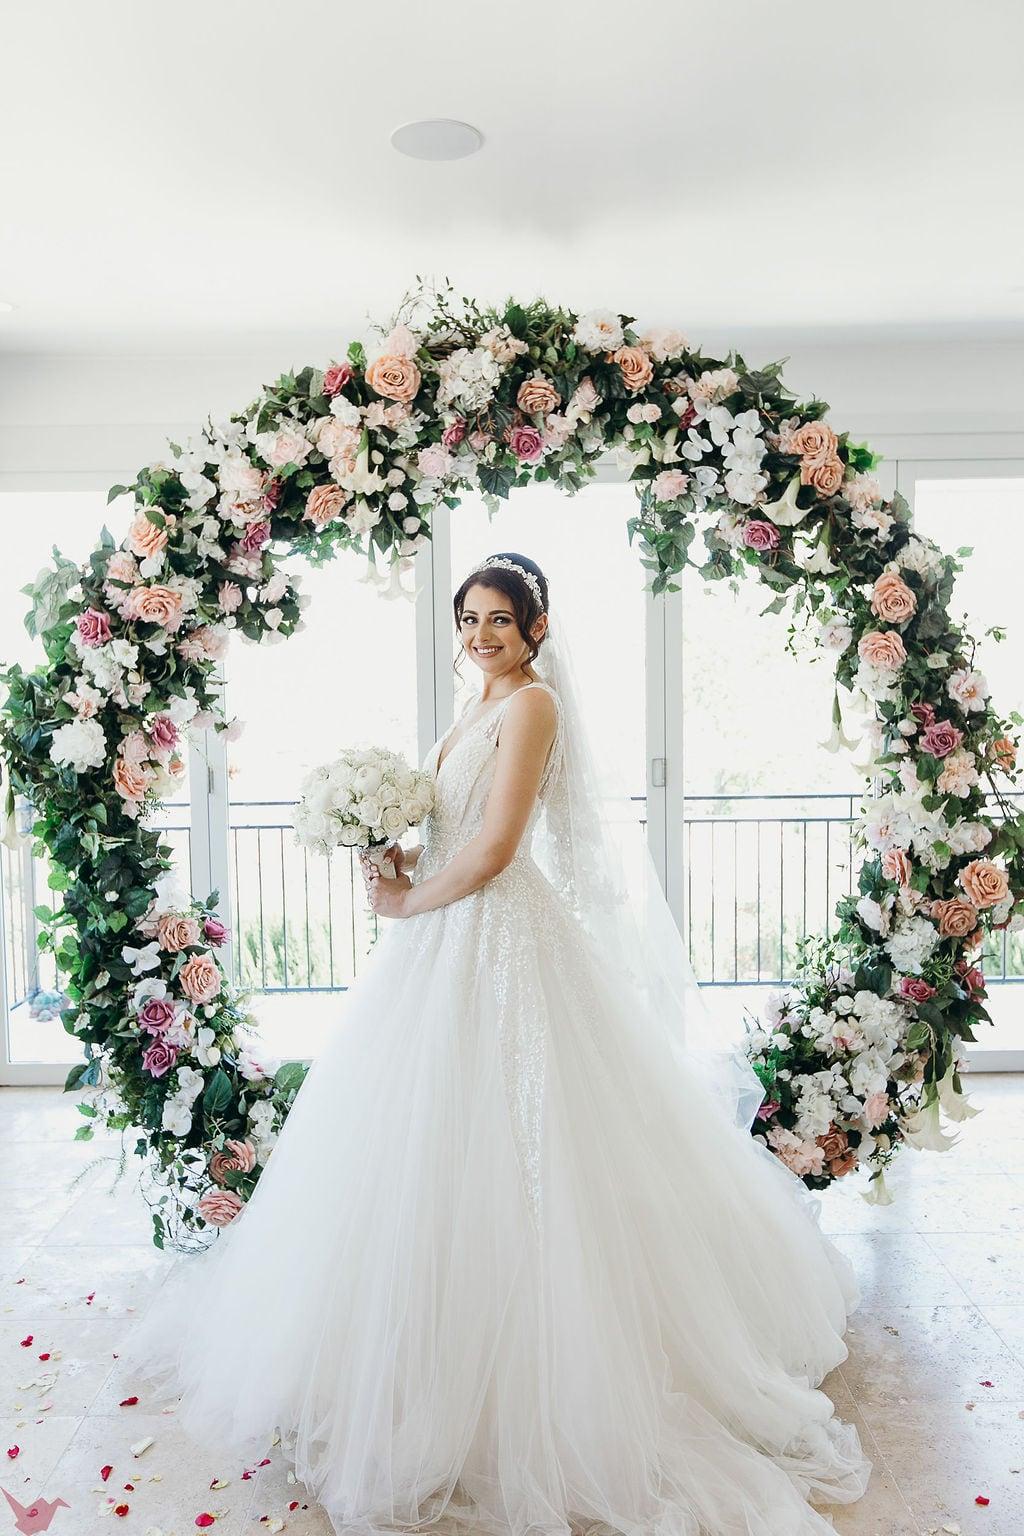 danielle-anthony-papercrane-wedding-photography-36.jpg